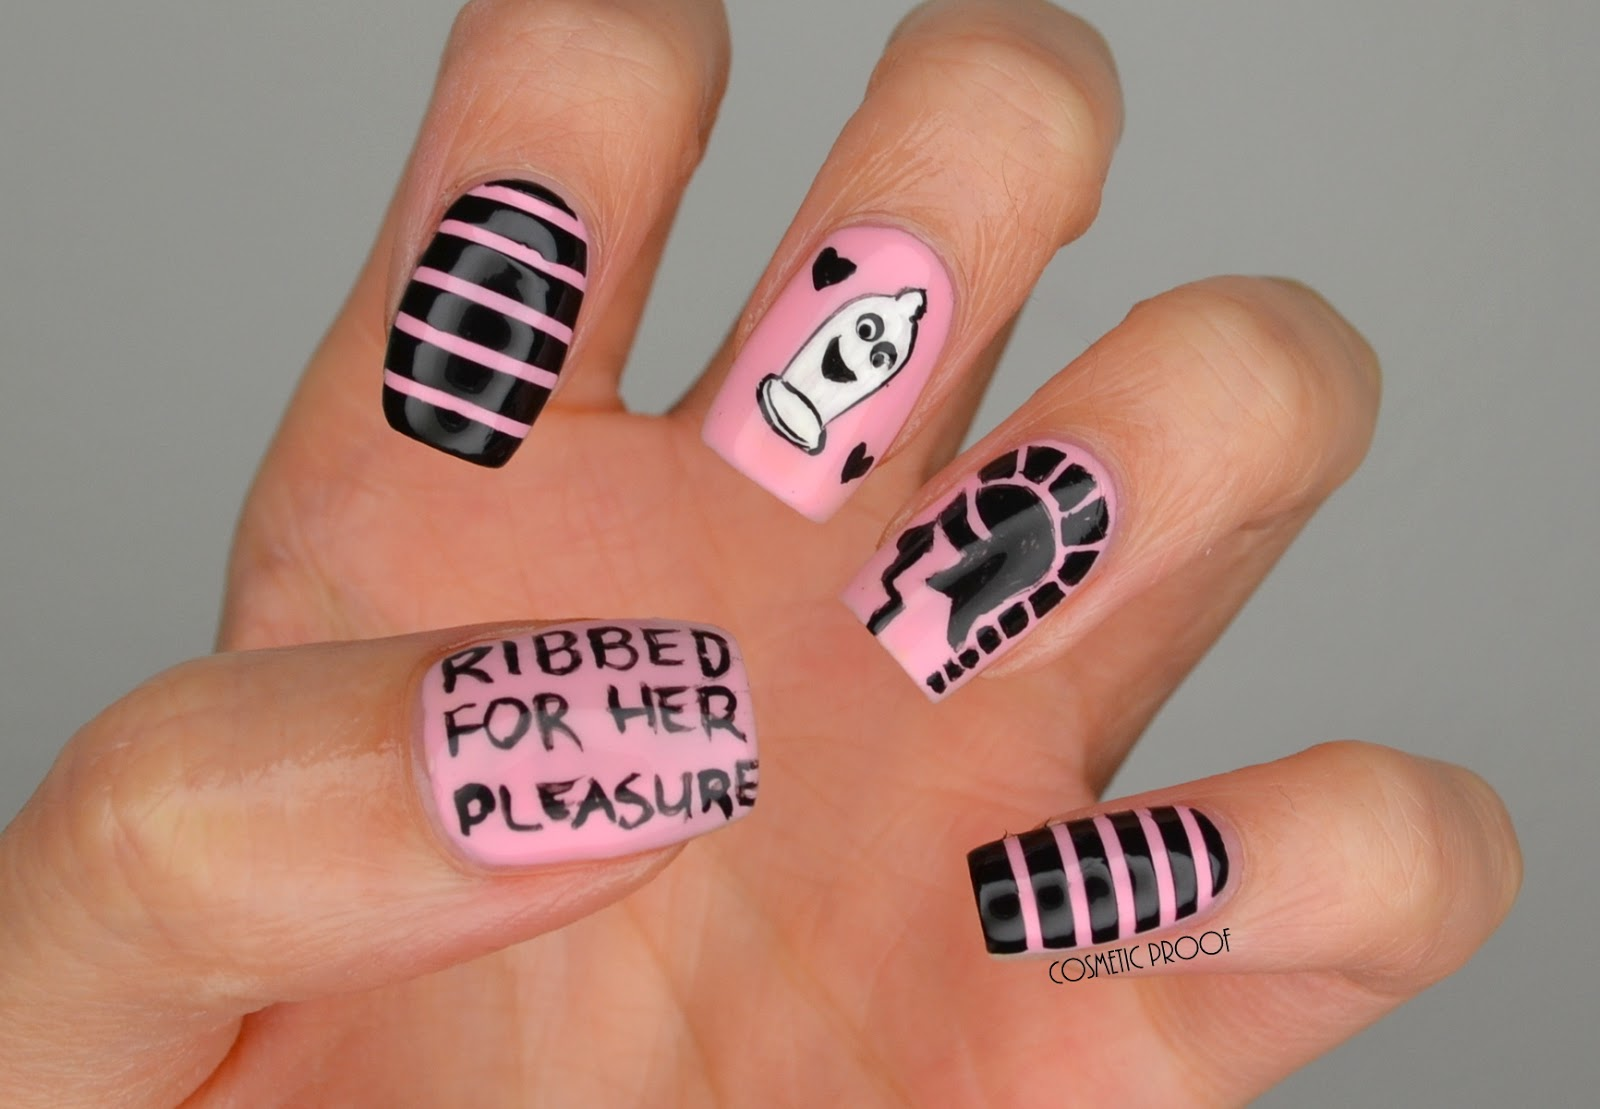 Nails trojan condom valentines day nail art cosmetic proof trojan condom nail art prinsesfo Images